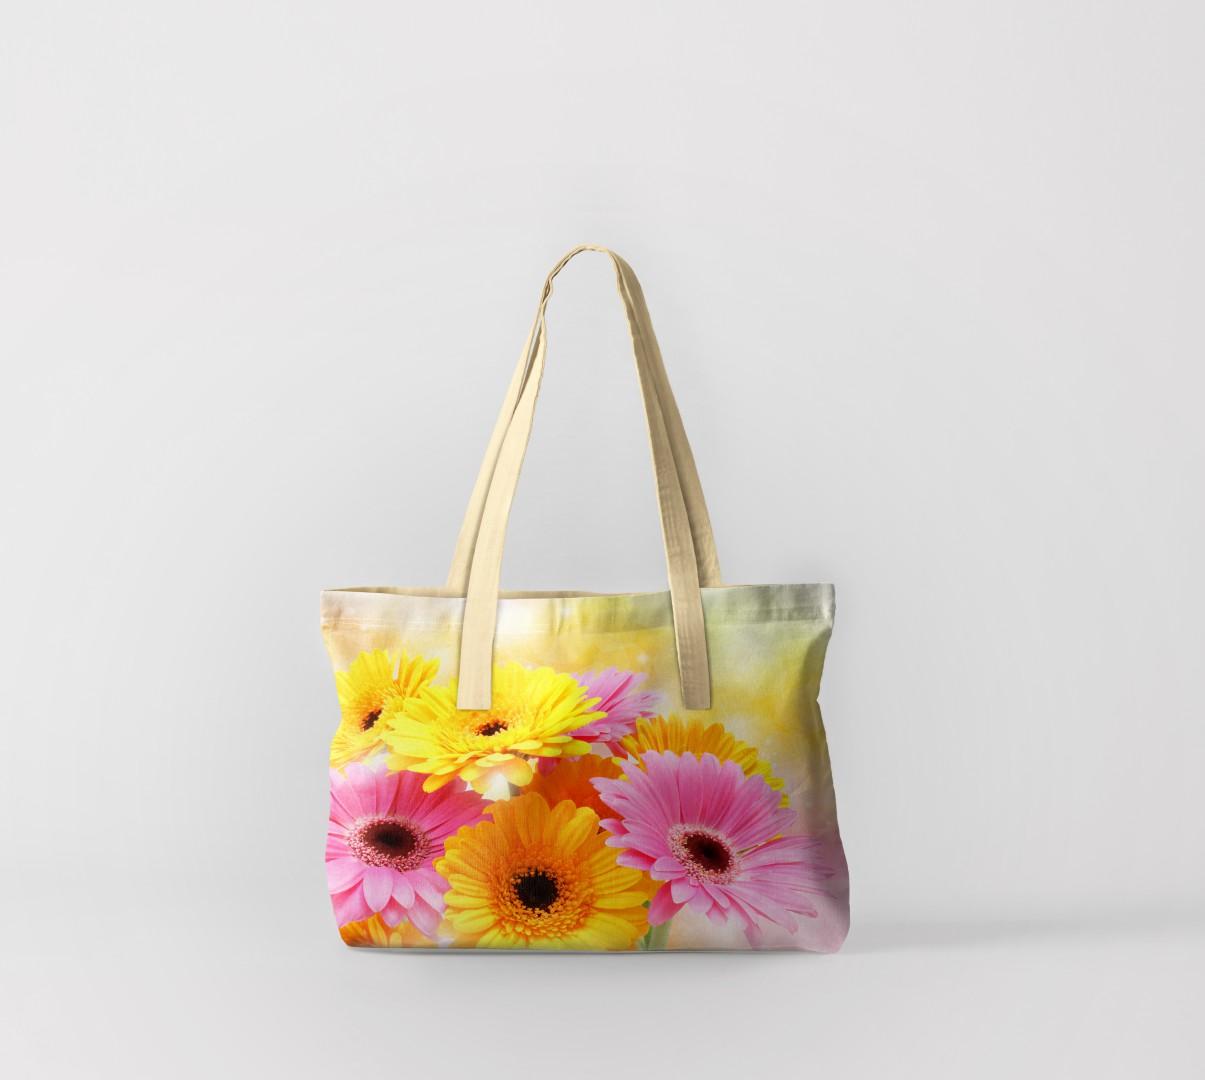 Пляжная сумка Герберы (50х40 см) Олимп Текстиль oli732563